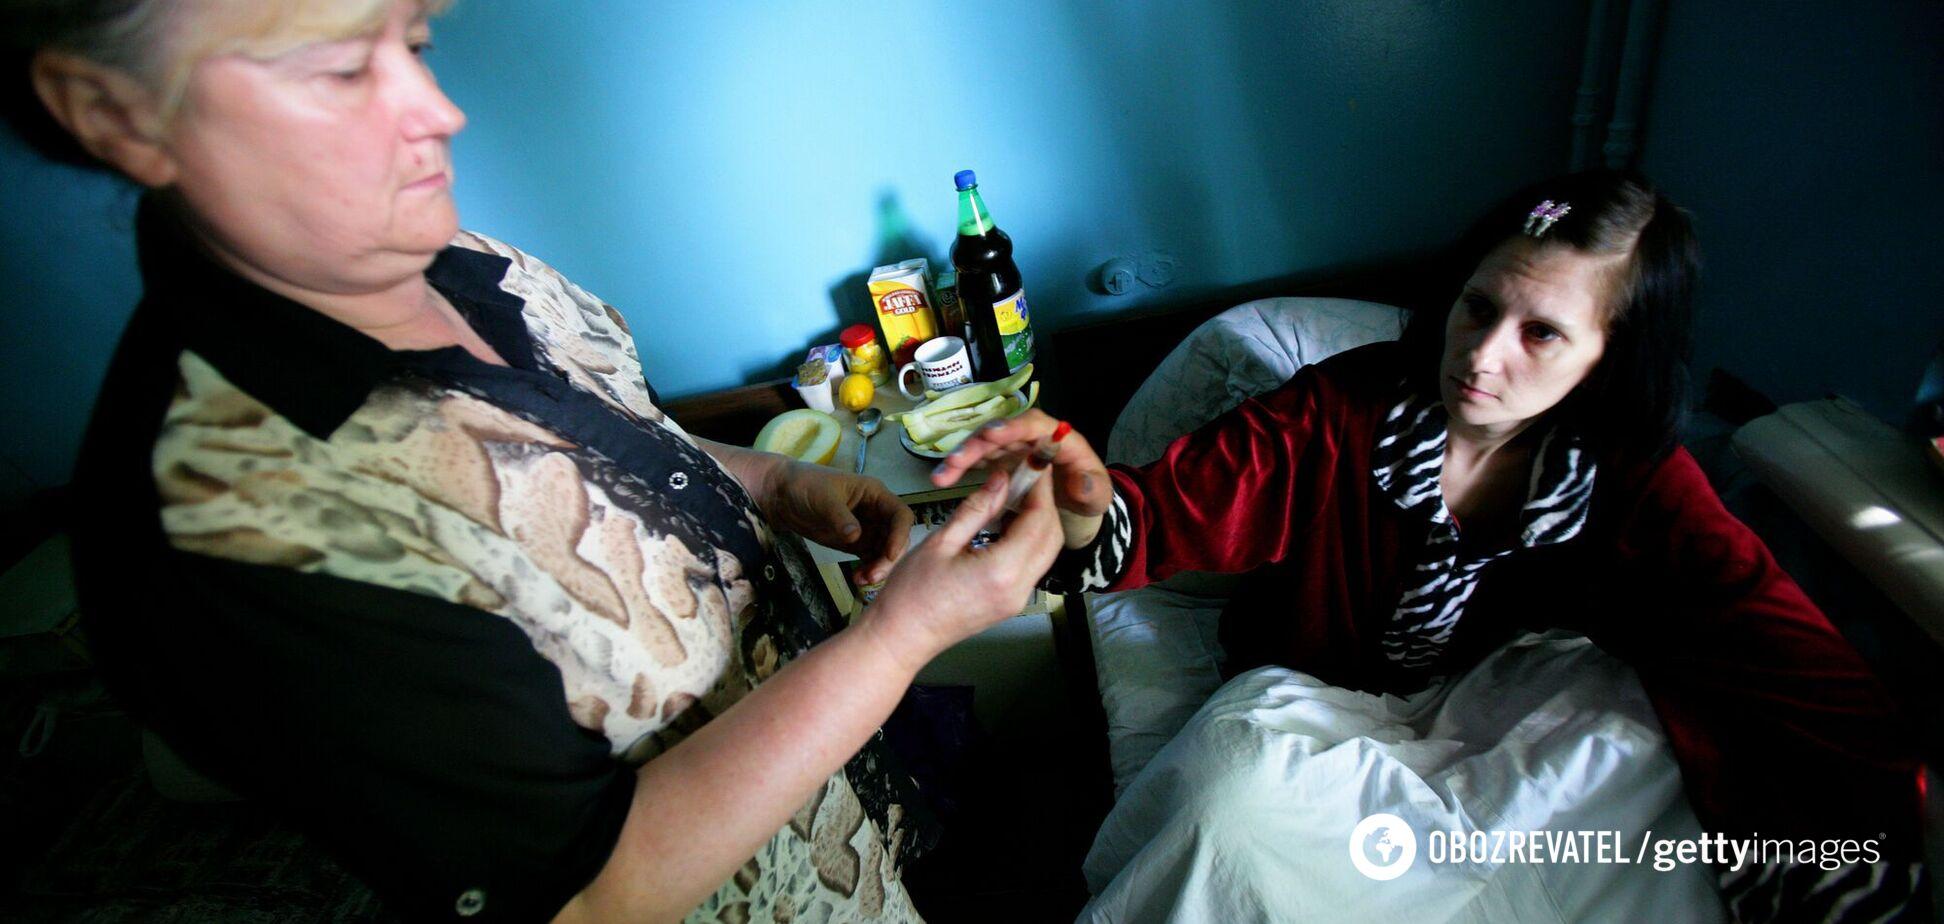 Врач предупредил о вспышке туберкулеза из-за карантина в Украине